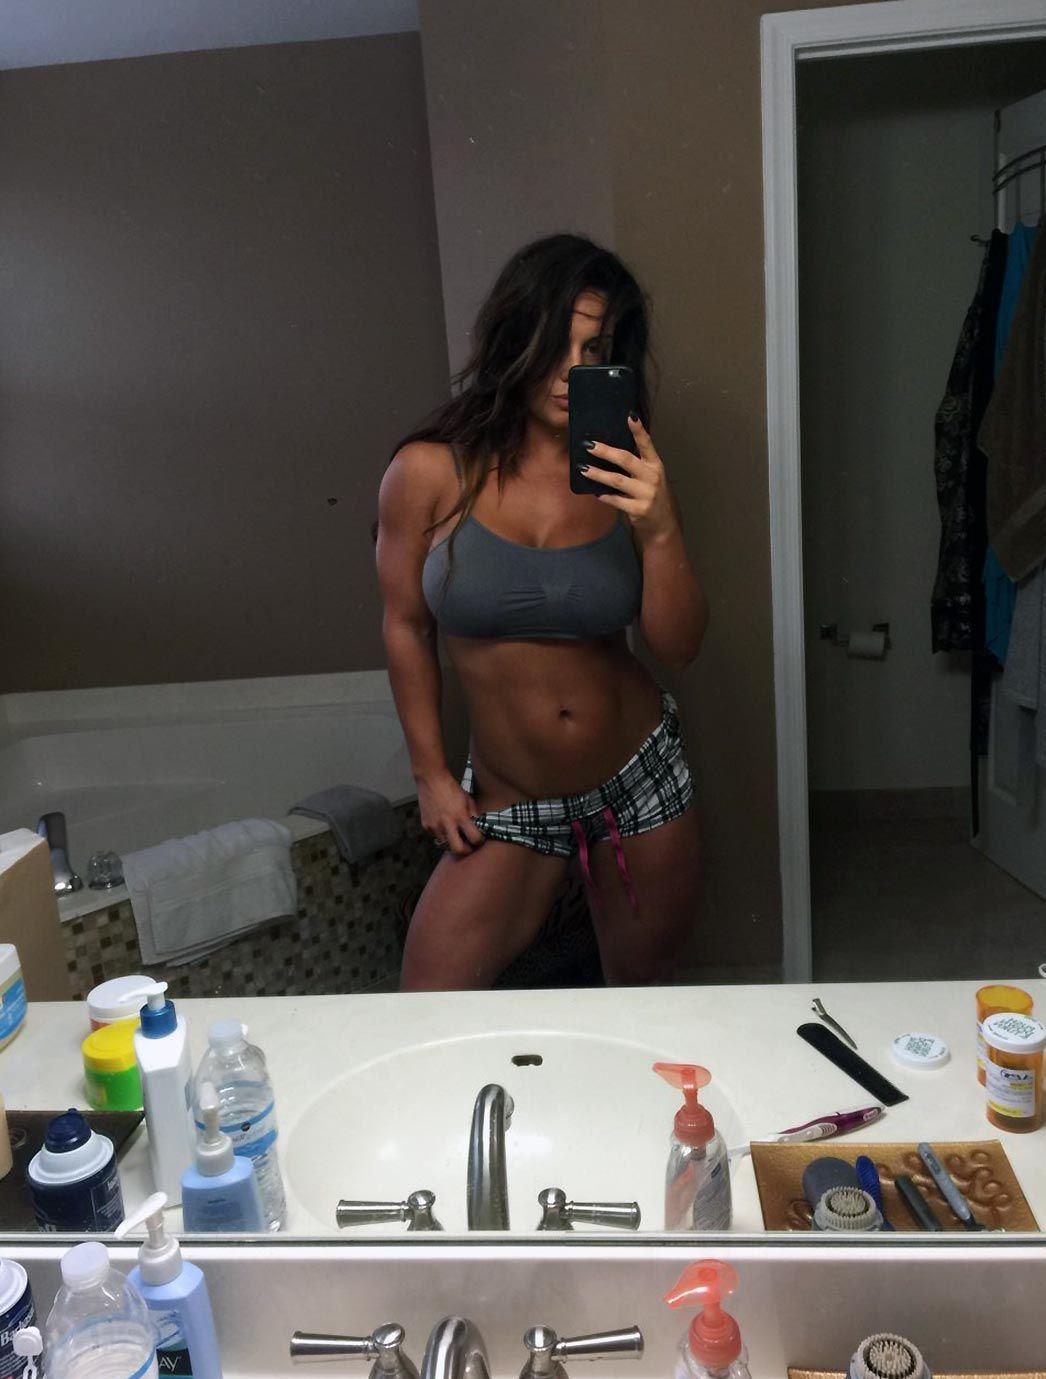 Celeste Bonin Nude Leaked The Fappening & Sexy 0241